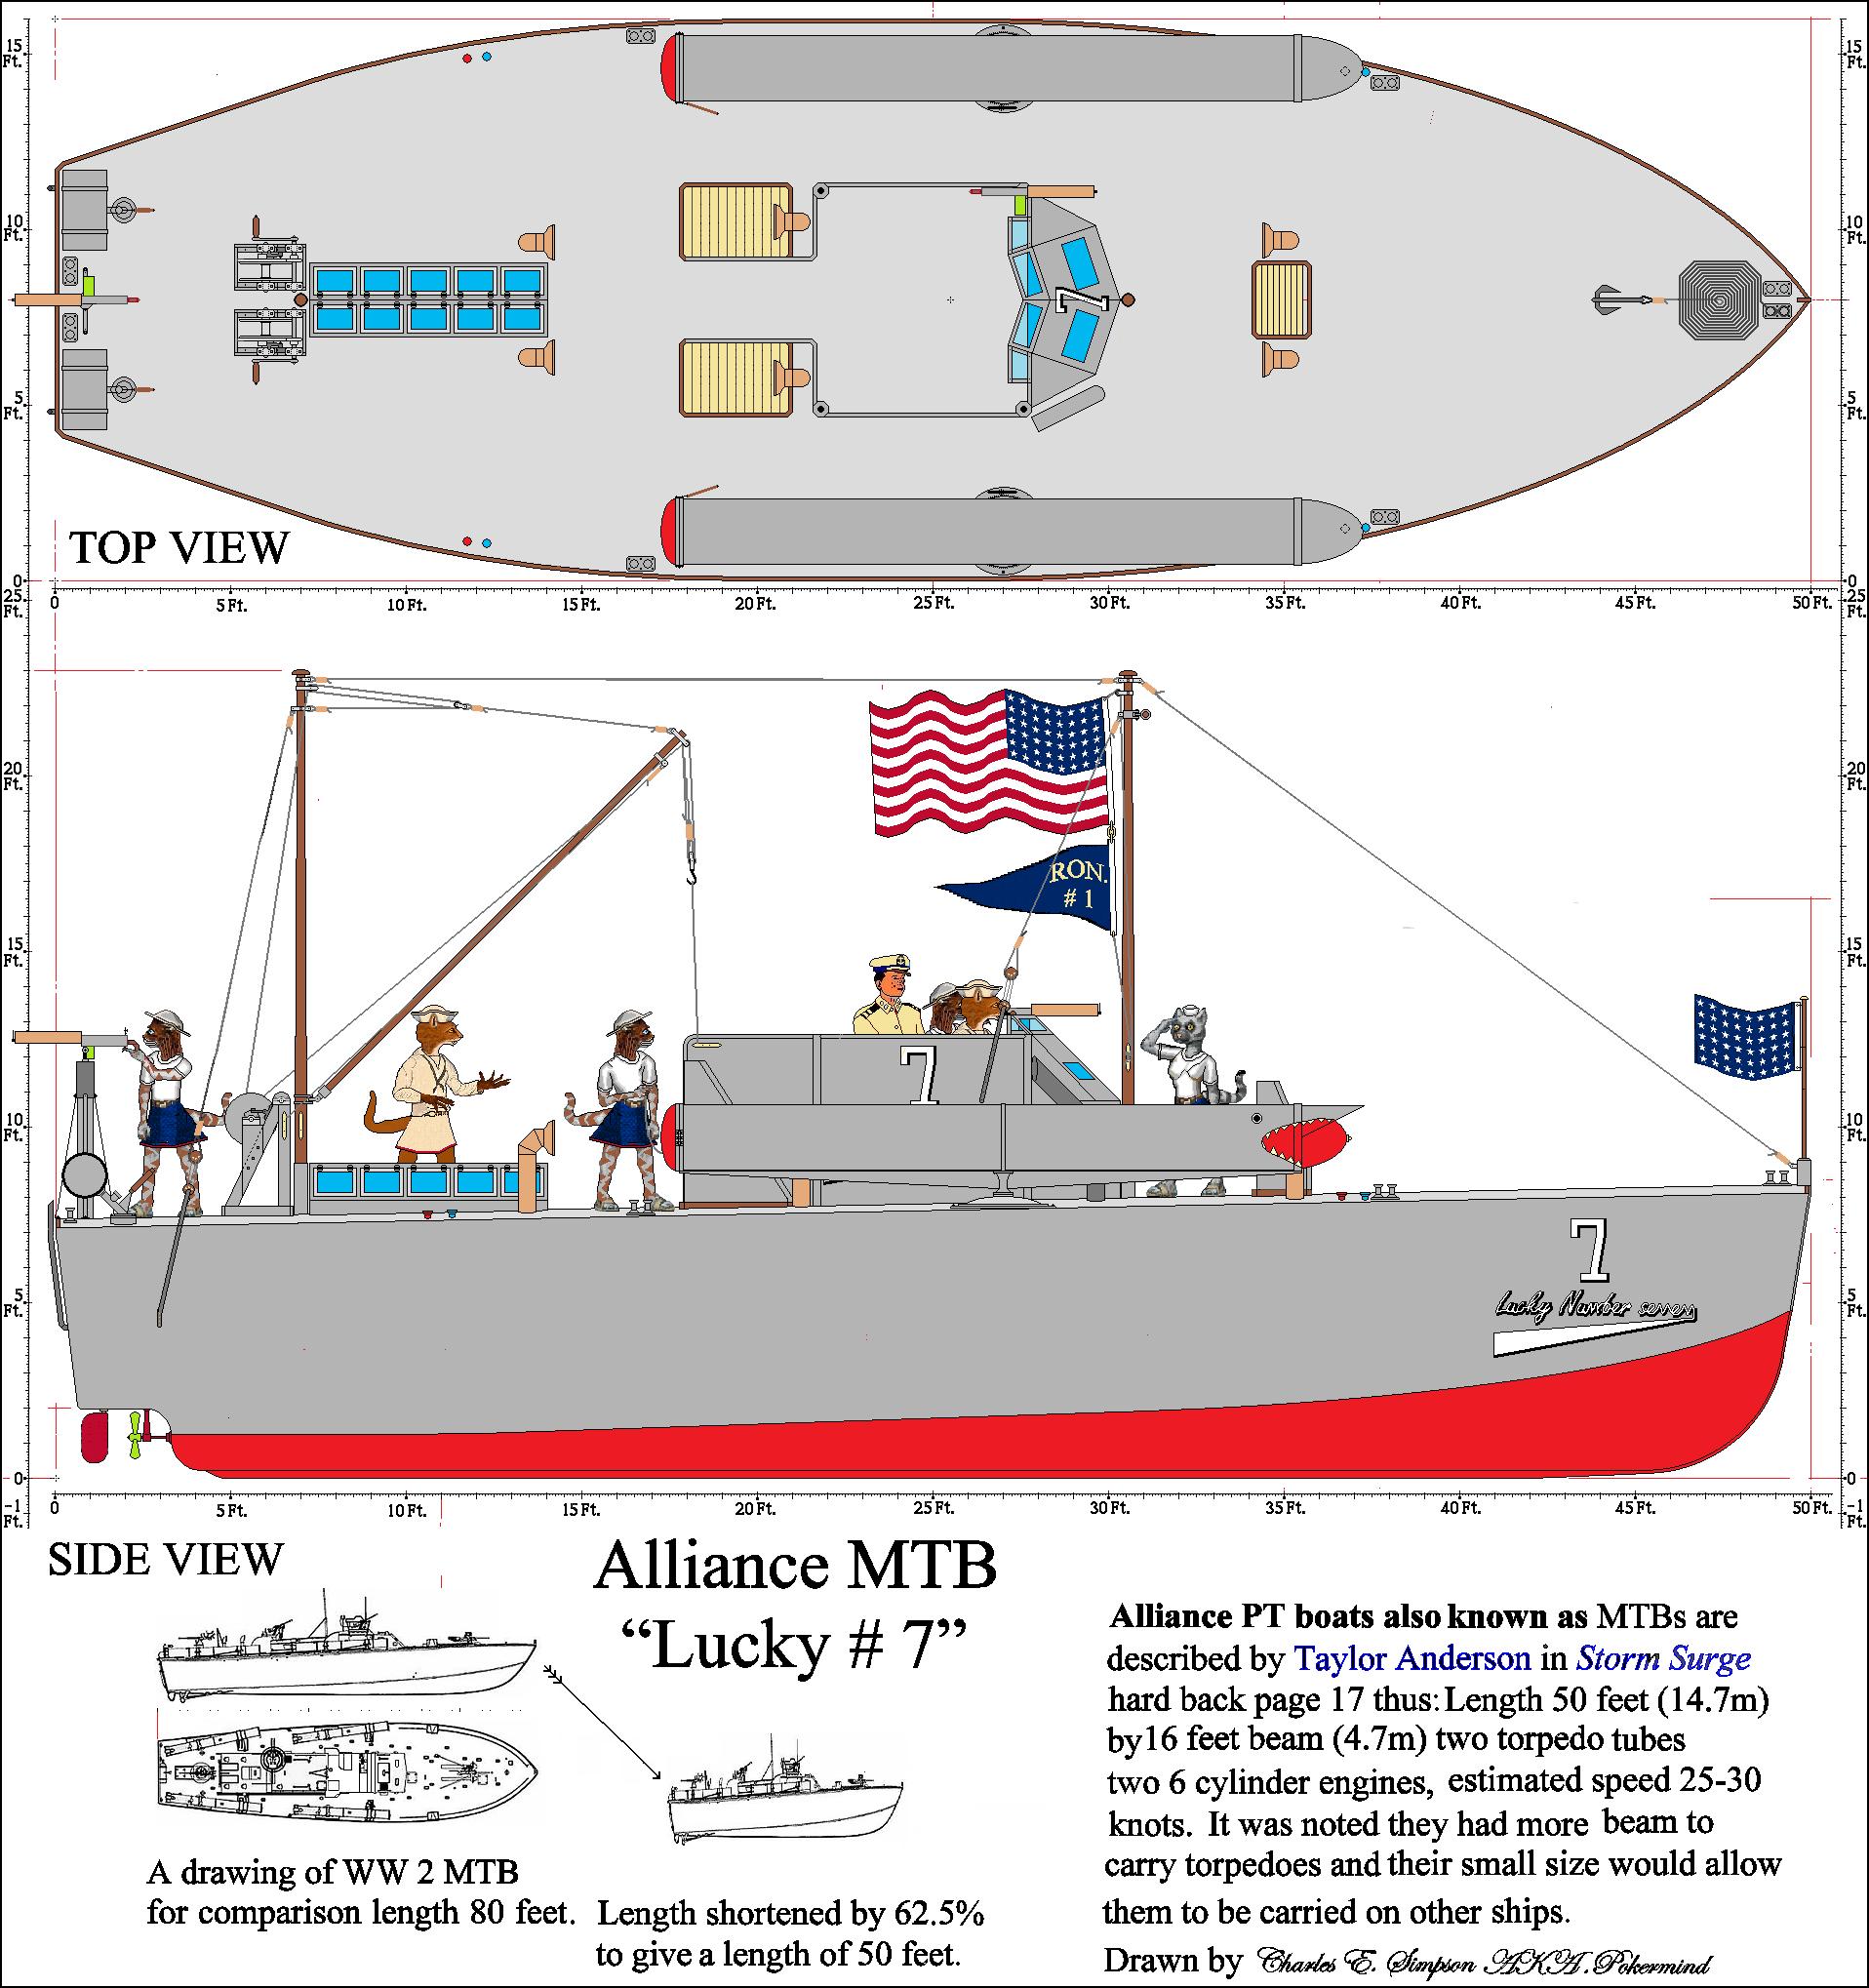 Alliance PT boats | Destroyermen Wiki | FANDOM powered by Wikia